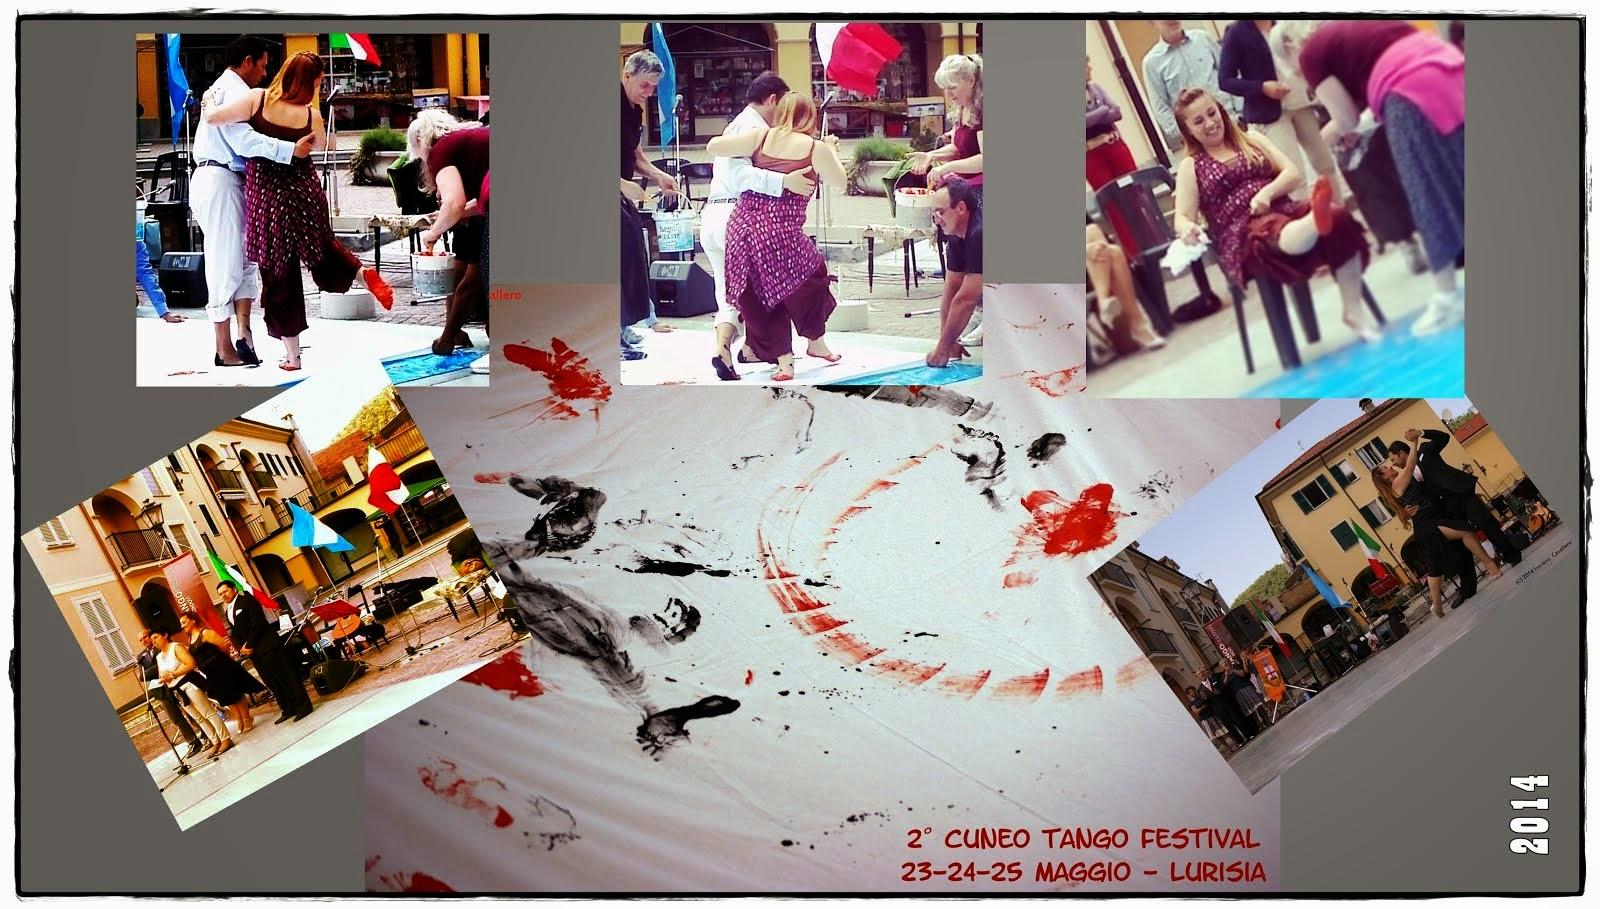 2° CUNEO TANGO FESTIVAL - 2014